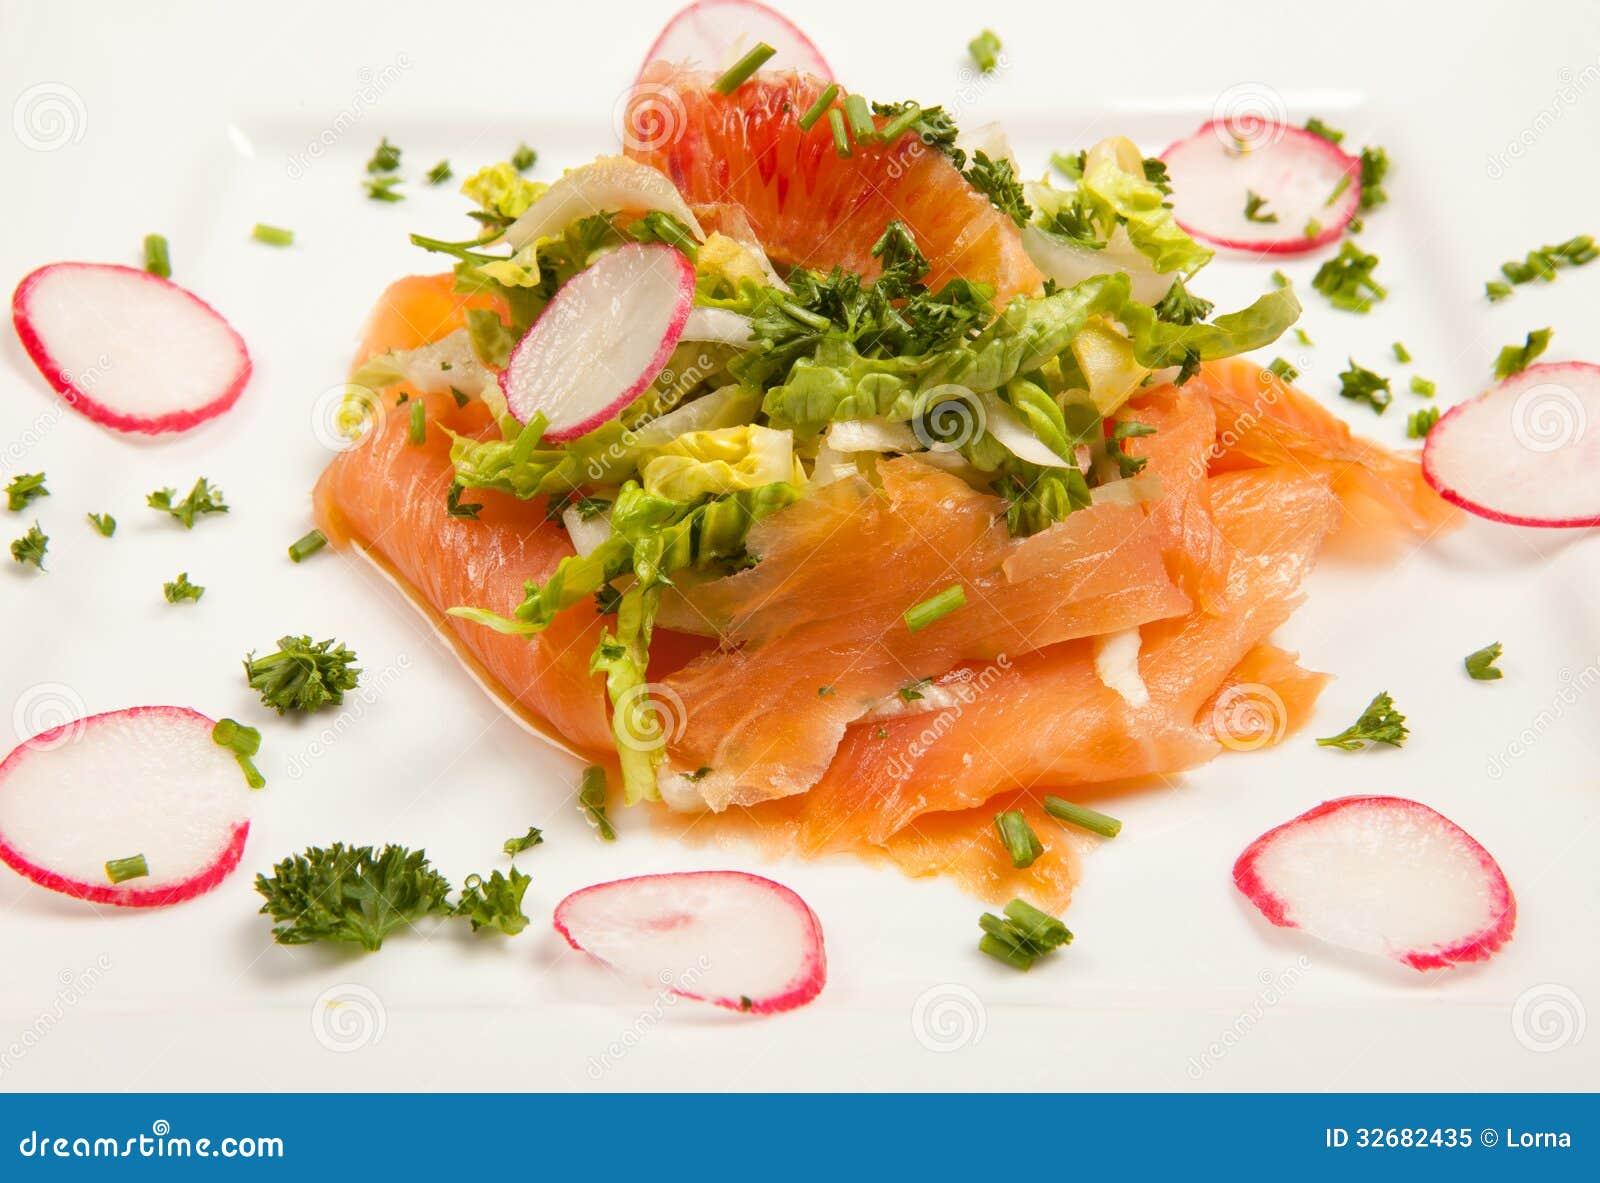 ... smoked salmon salad with blood orange and radish. seafood appetizer